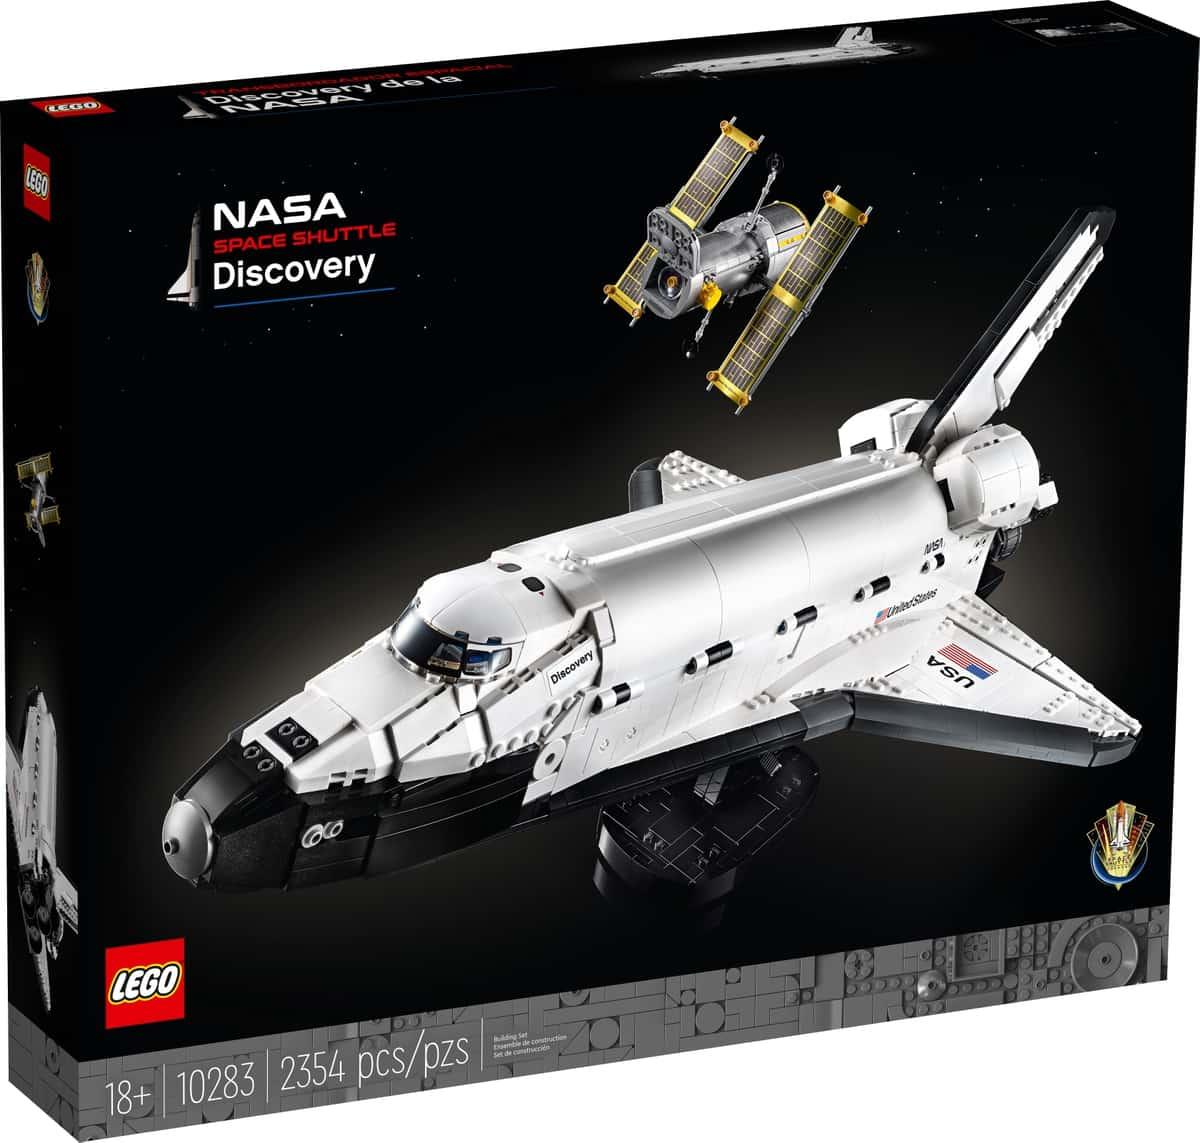 lego 10283 la navette spatiale discovery de la nasa